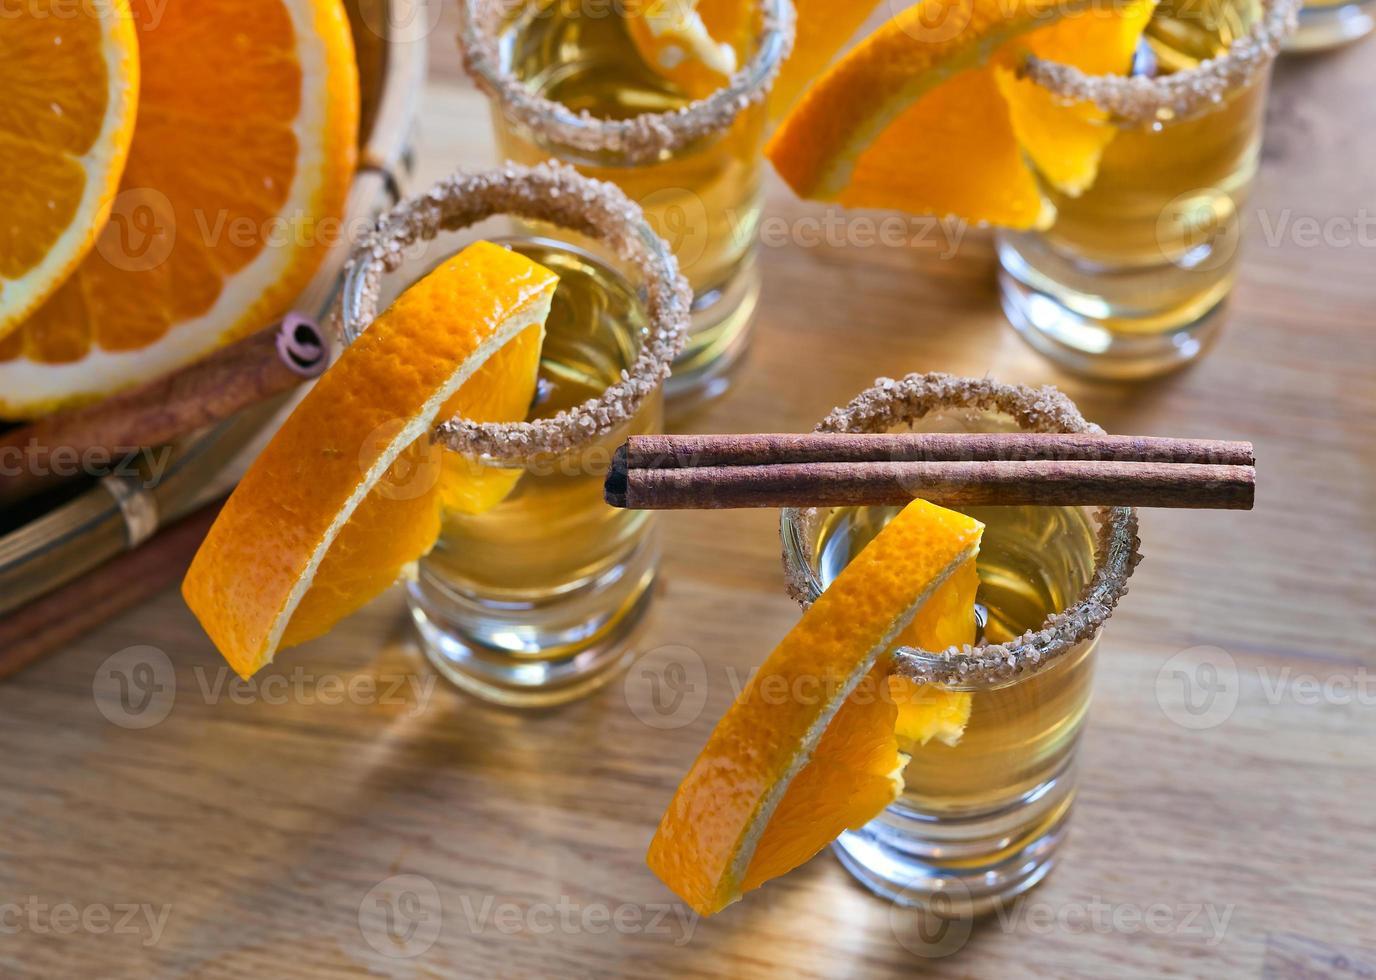 tequila met sinaasappel foto